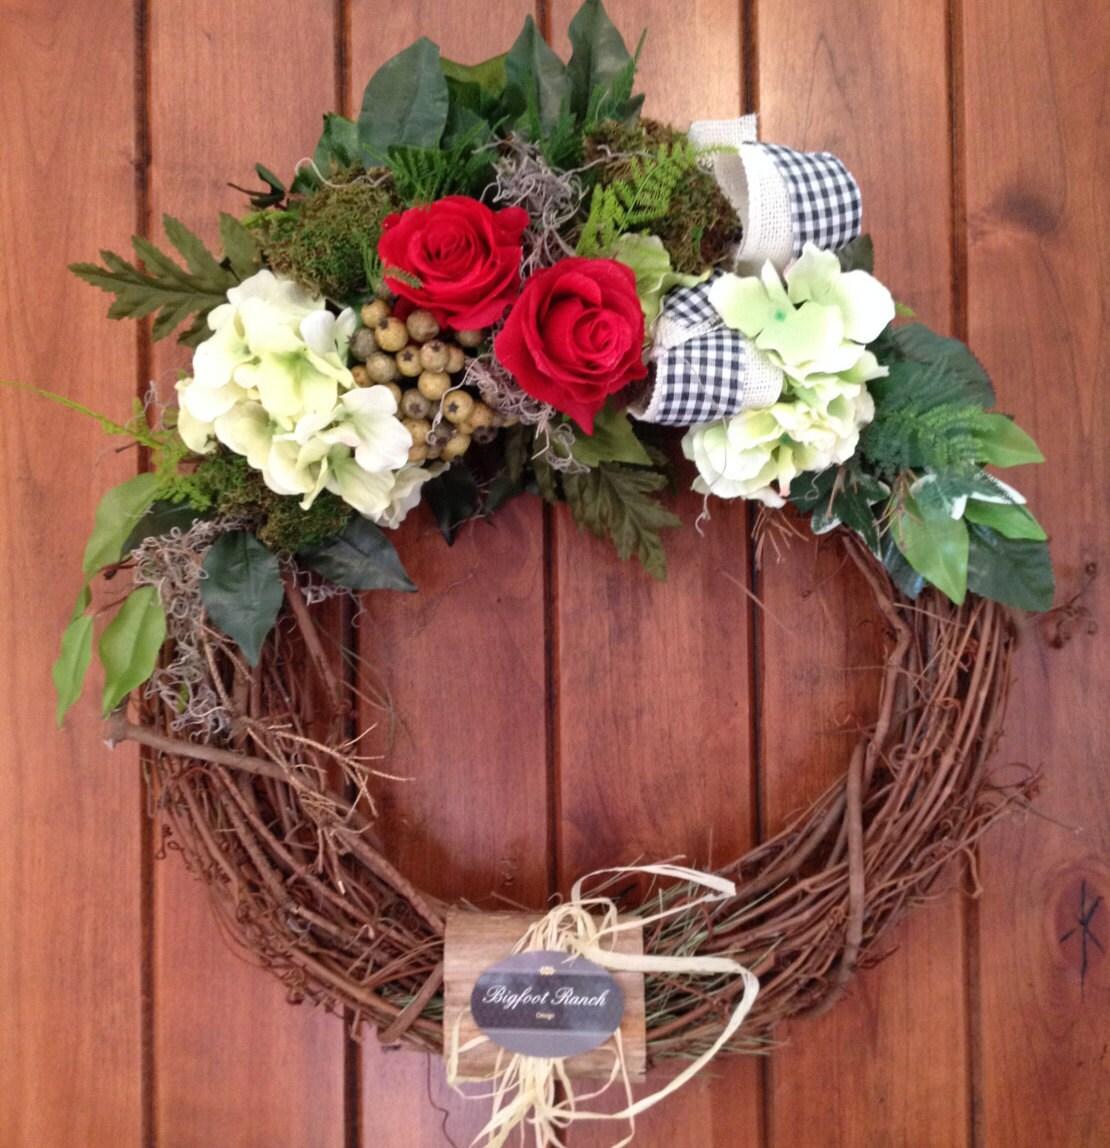 front door wreath outdoor wreath indoor wreath all season wreath spring wreath summer wreath floral wreath large wreath wreath